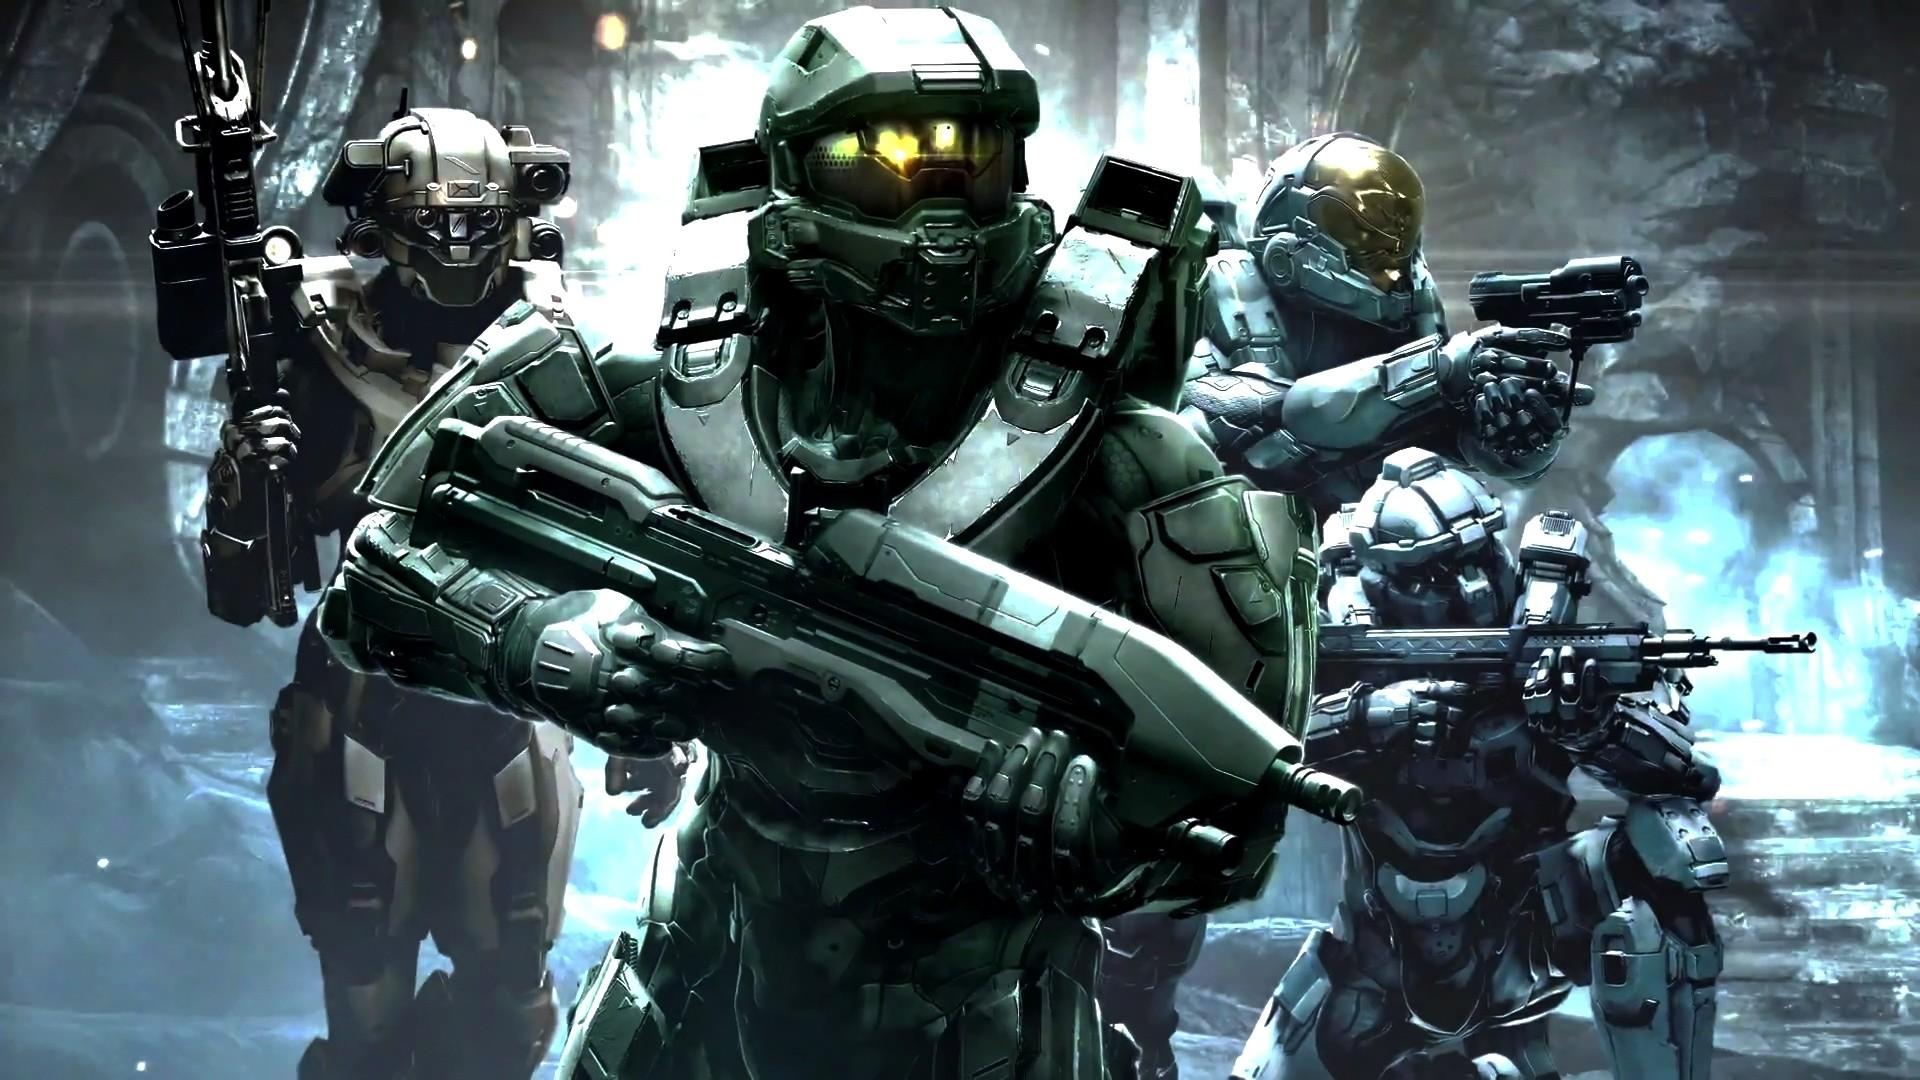 Halo Spartan Wallpaper 73 Images